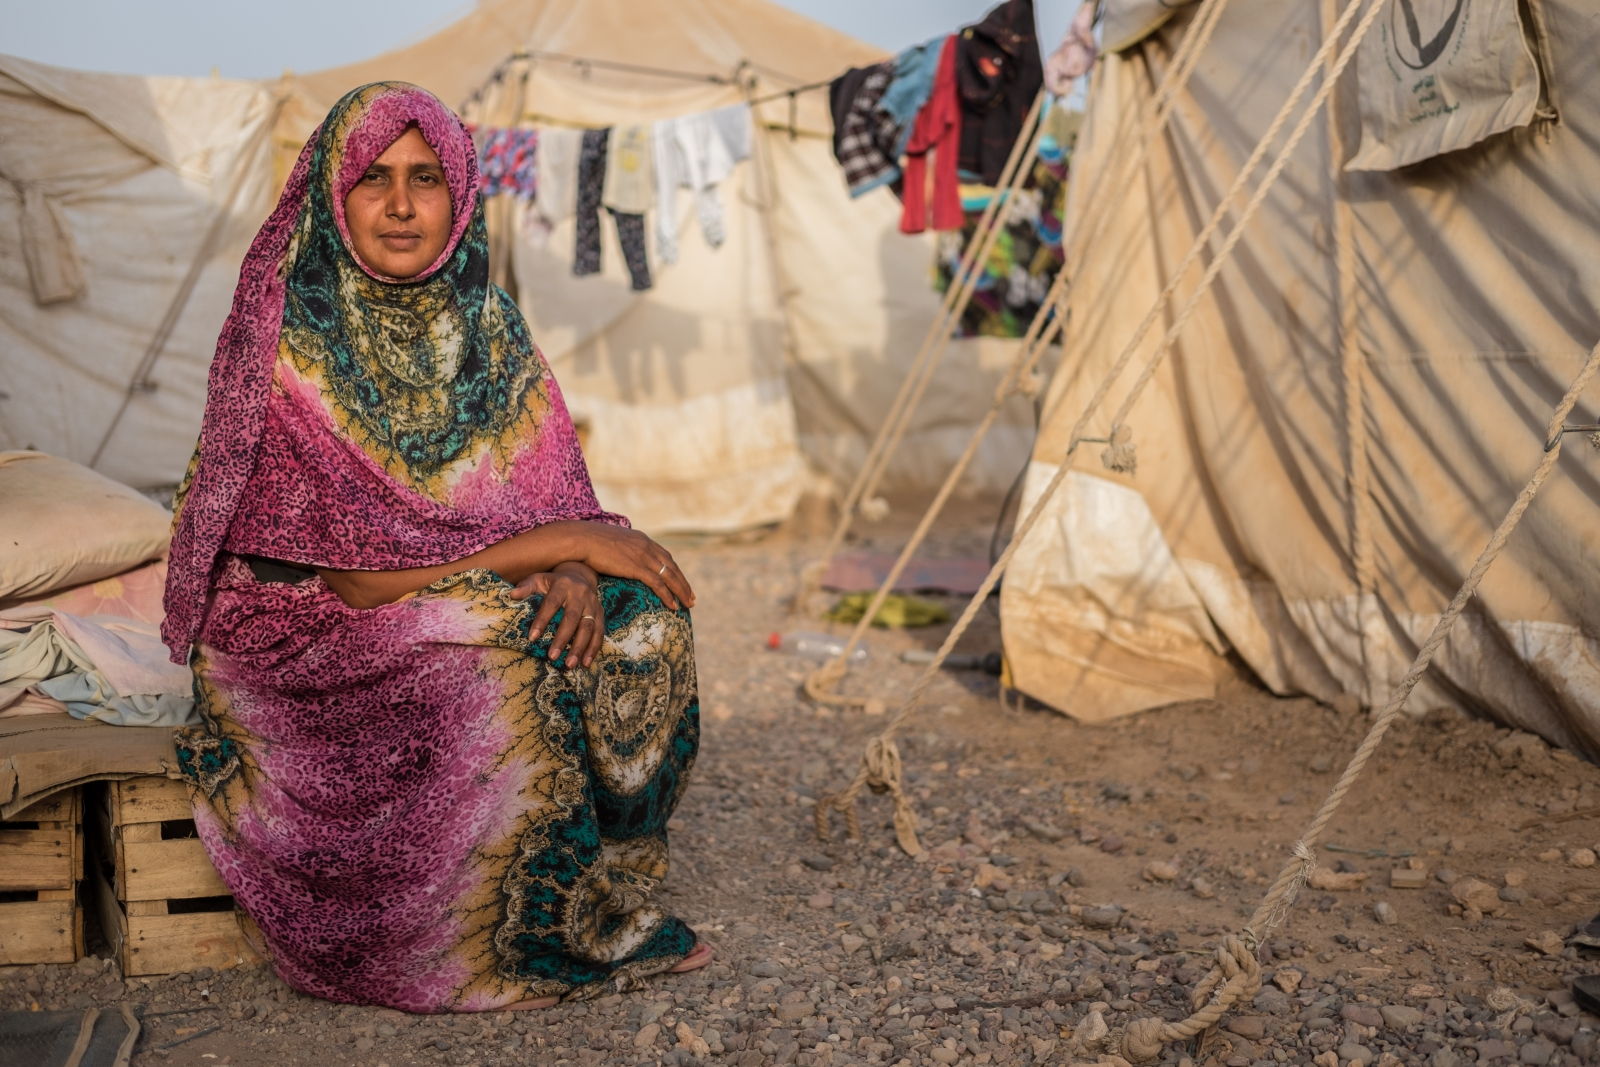 Djibouti opens its doors to refugees from war-torn Yemen  Yemen And Djibouti